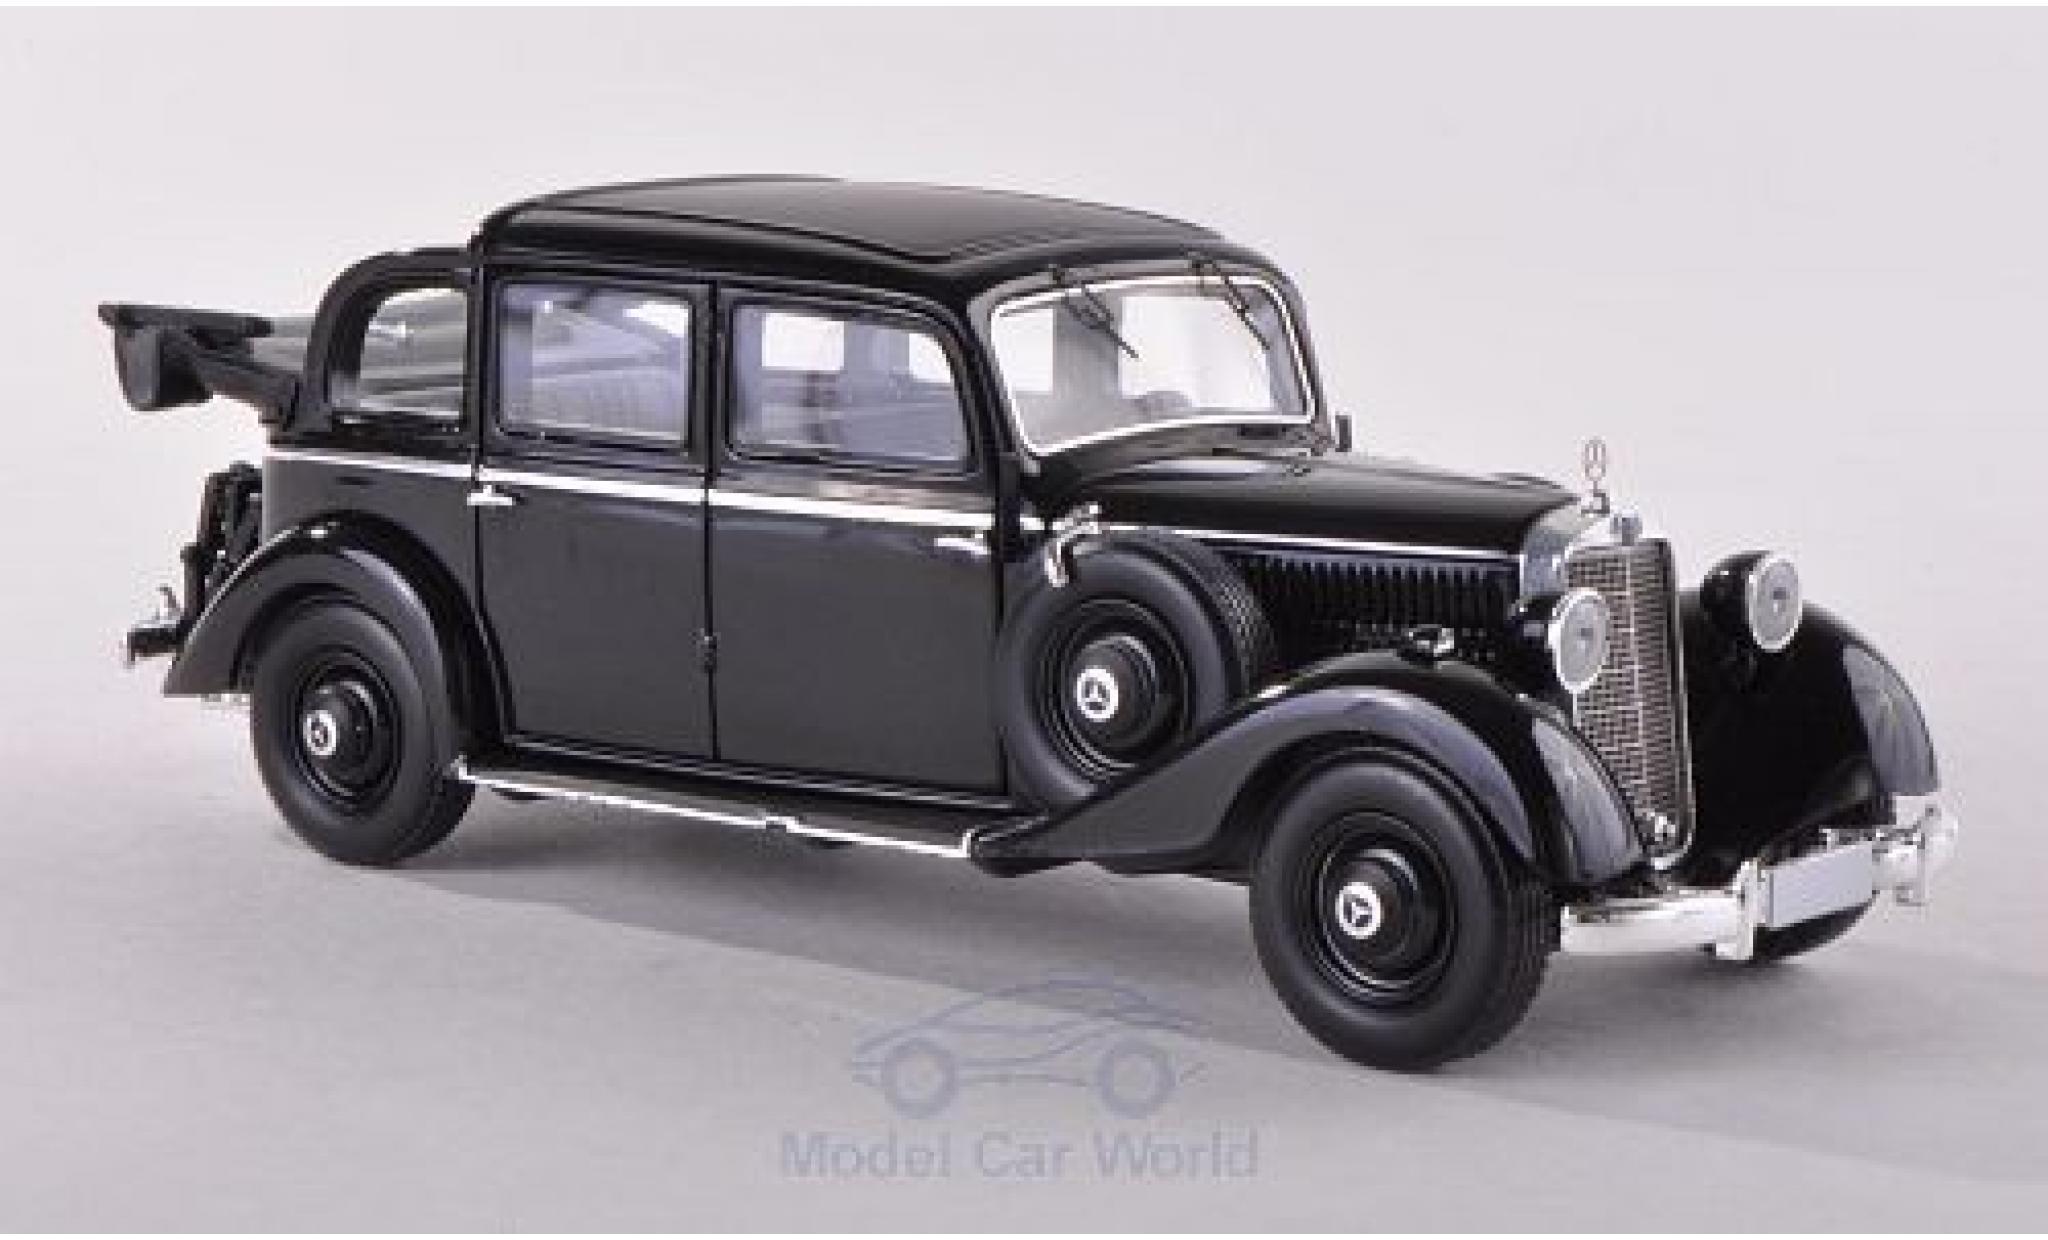 Mercedes 260 1/43 Esval Models D Pullmann Landaulet noire 1936 geöffnet